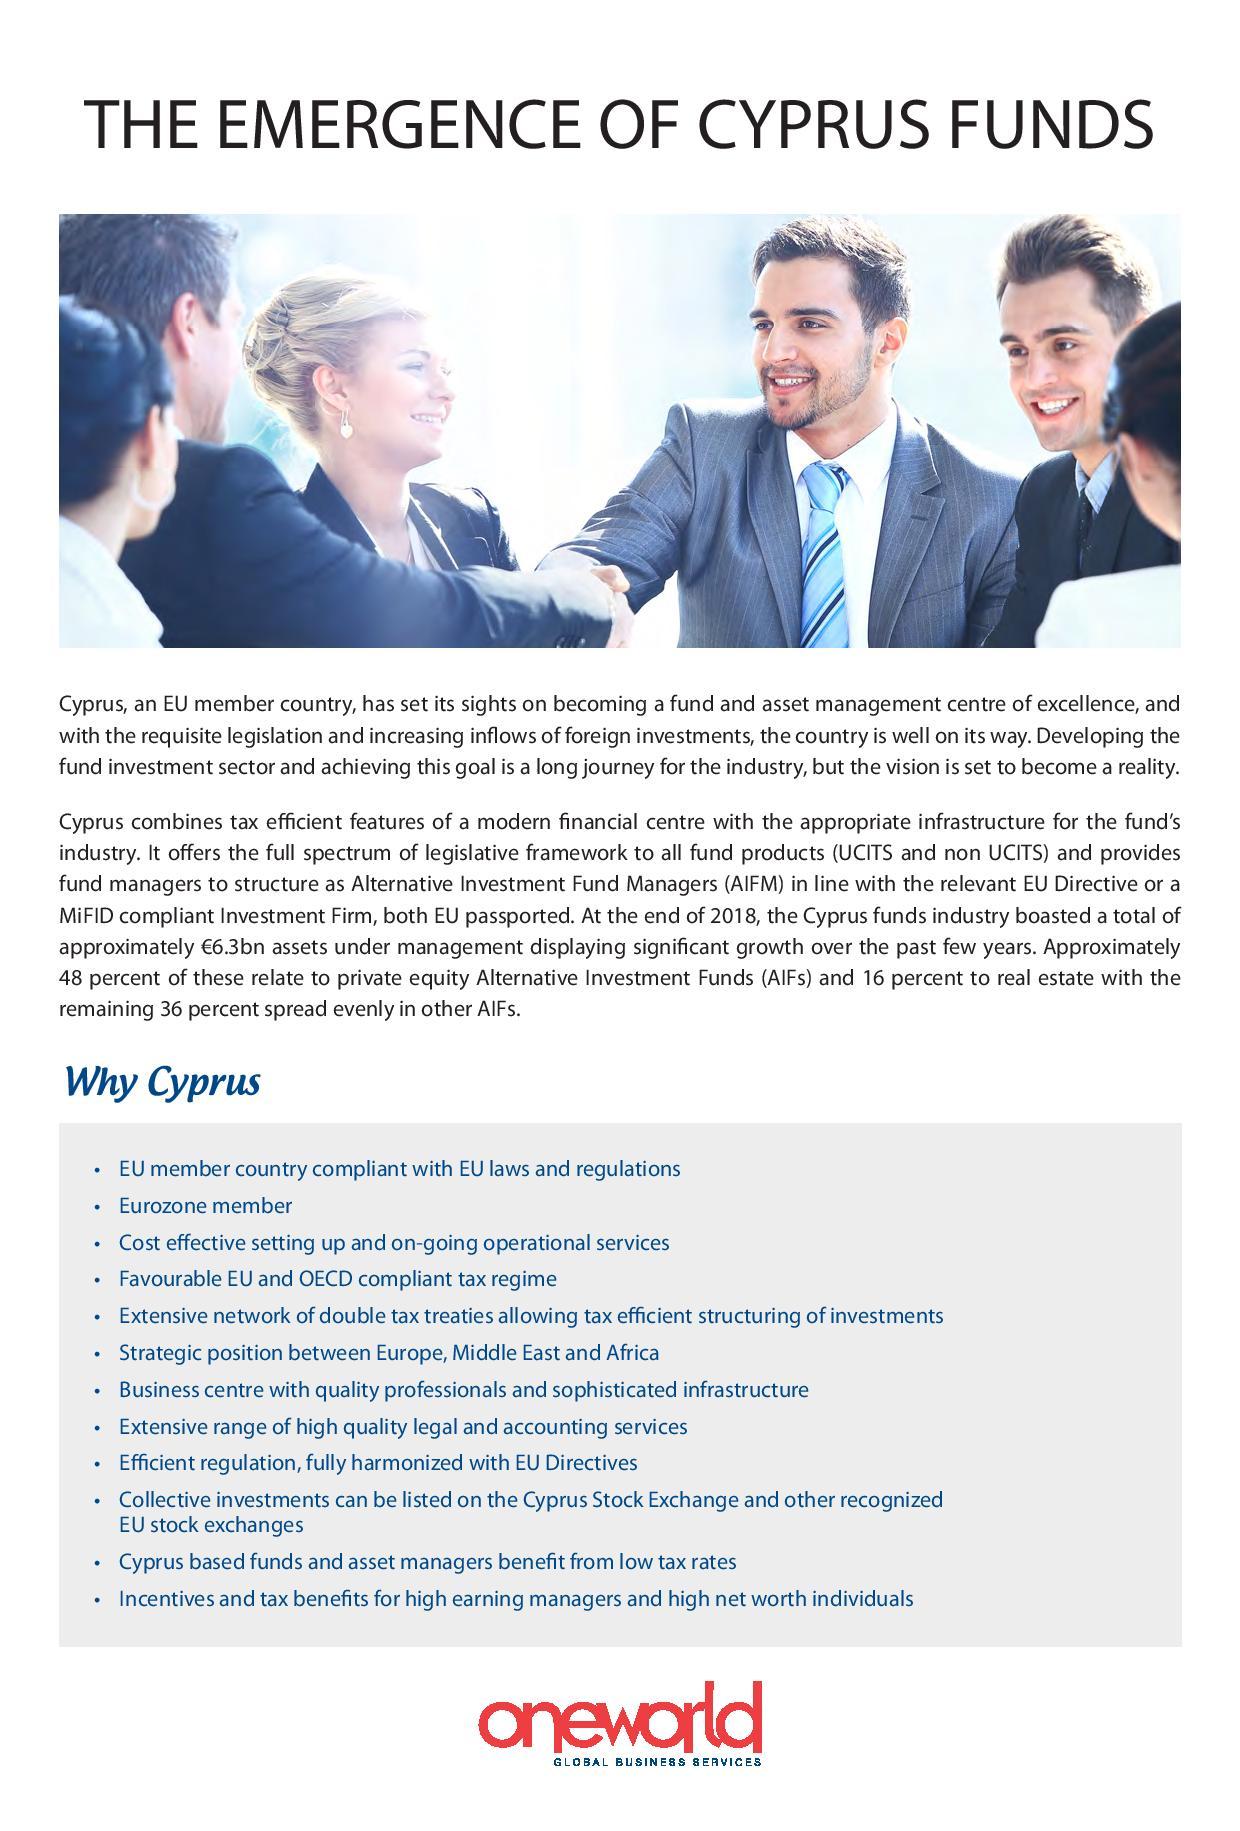 Oneworld Ltd: The Emergence of Cyprus Funds